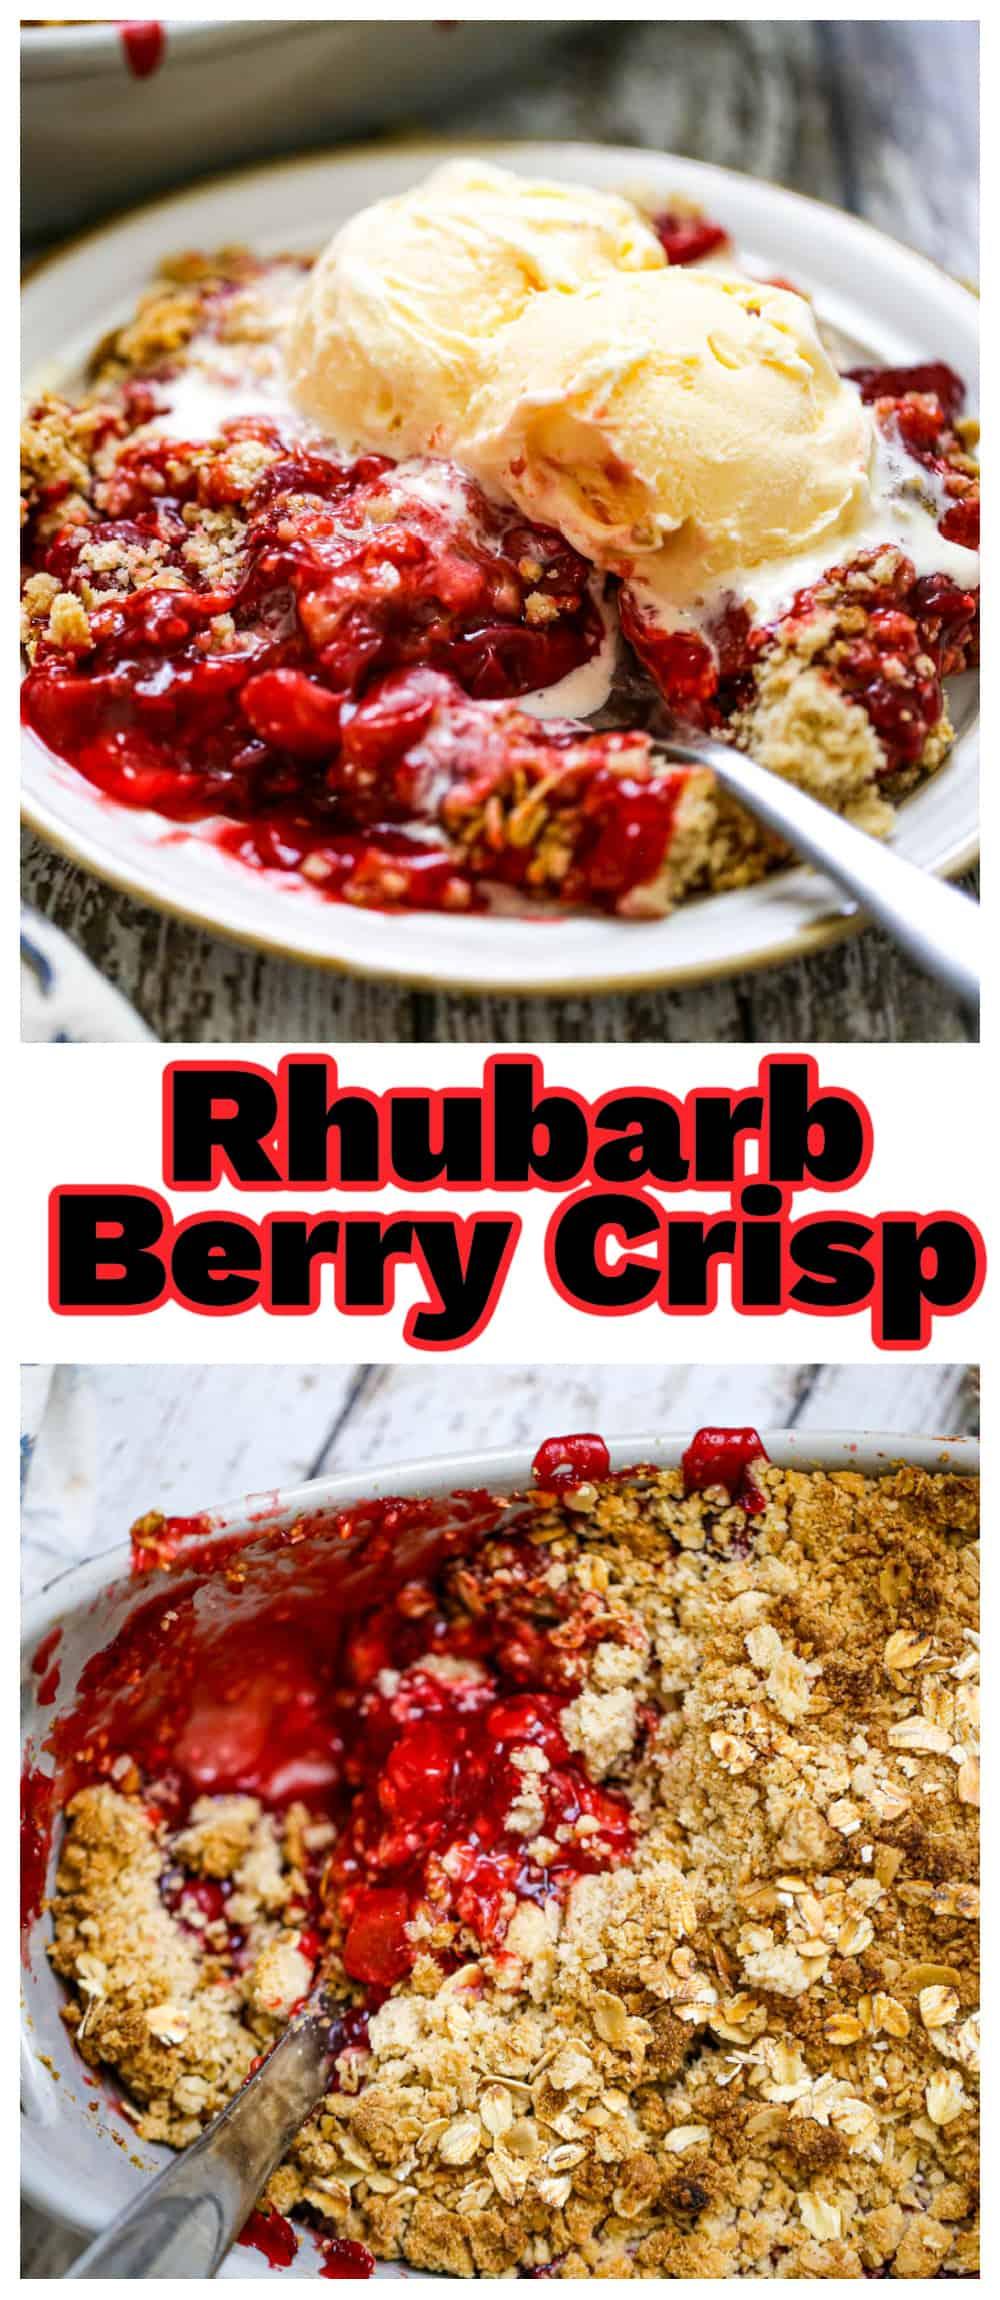 Rhubarb Berry Crisp